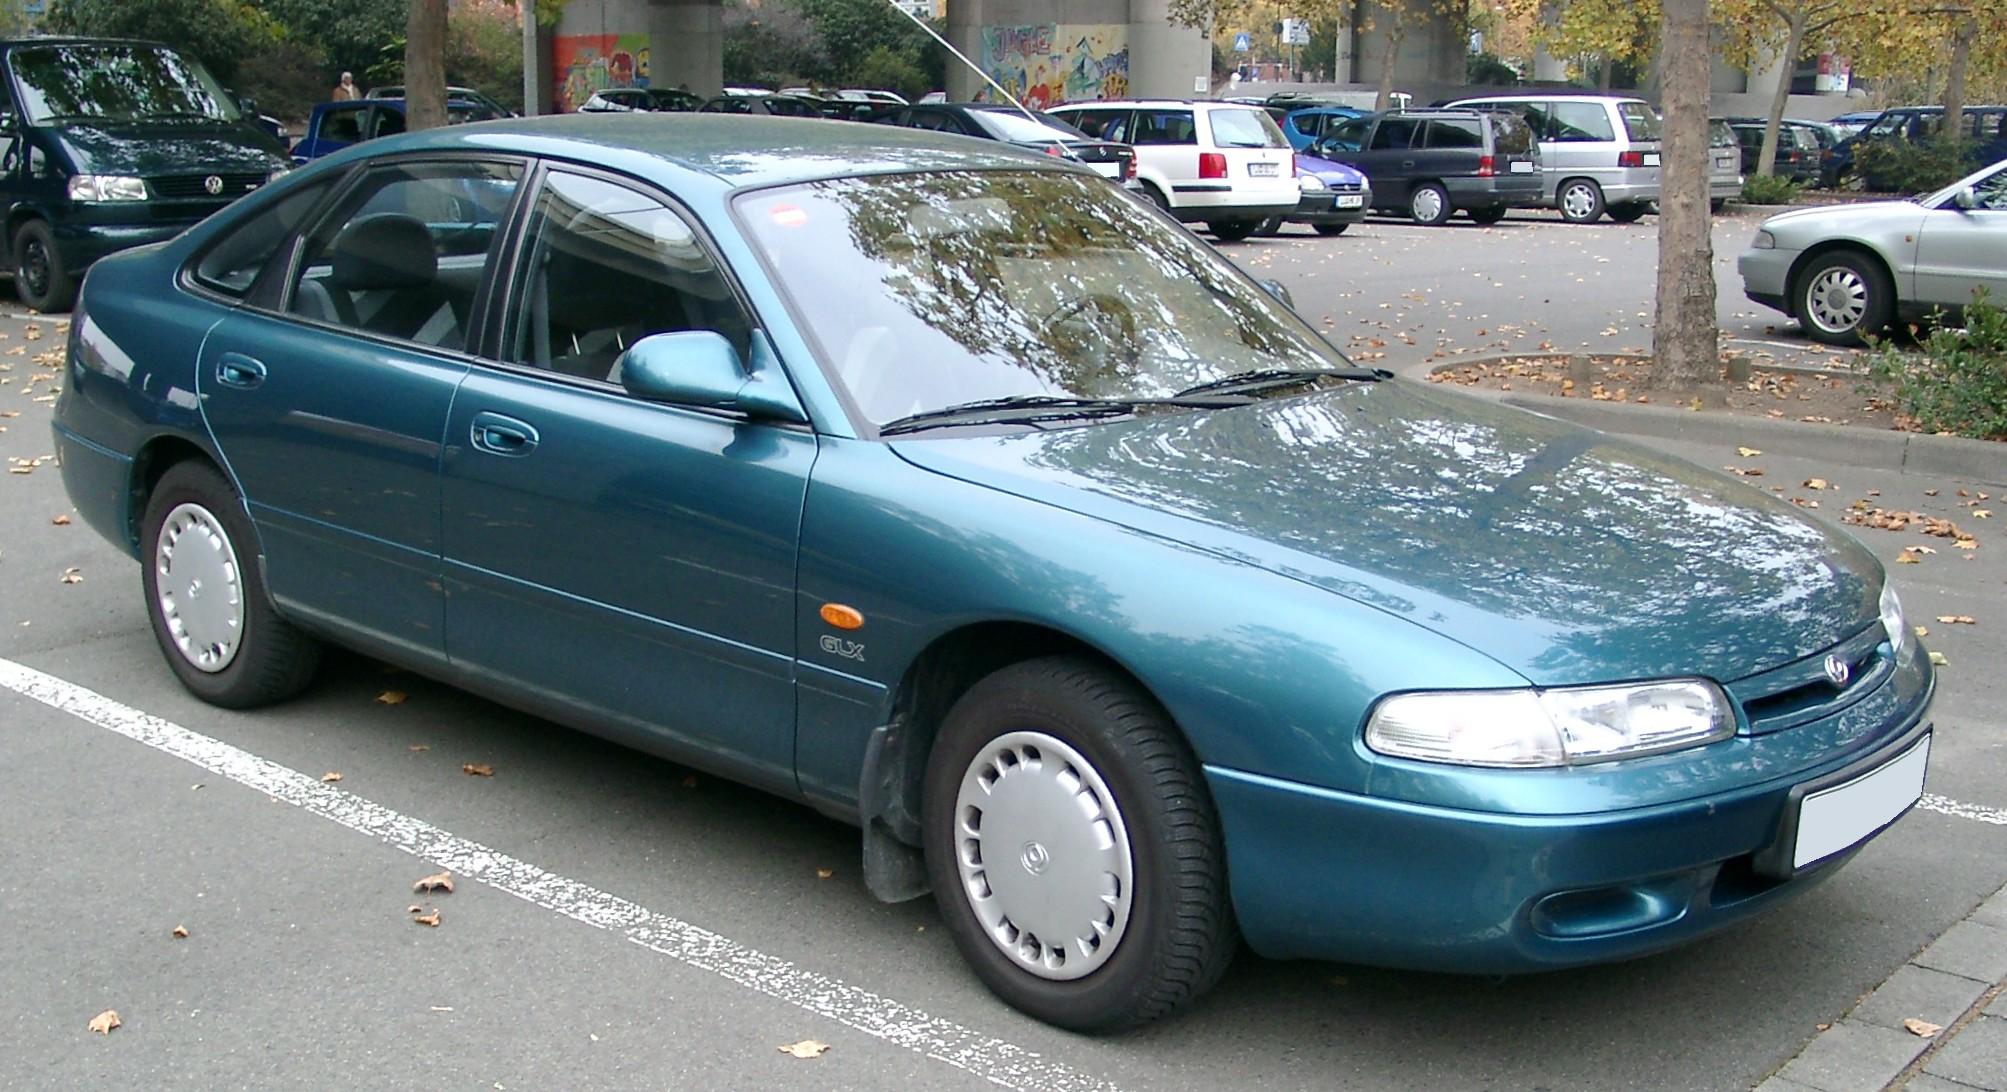 File:Mazda 626 front 20071102.jpg - Wikimedia Commons